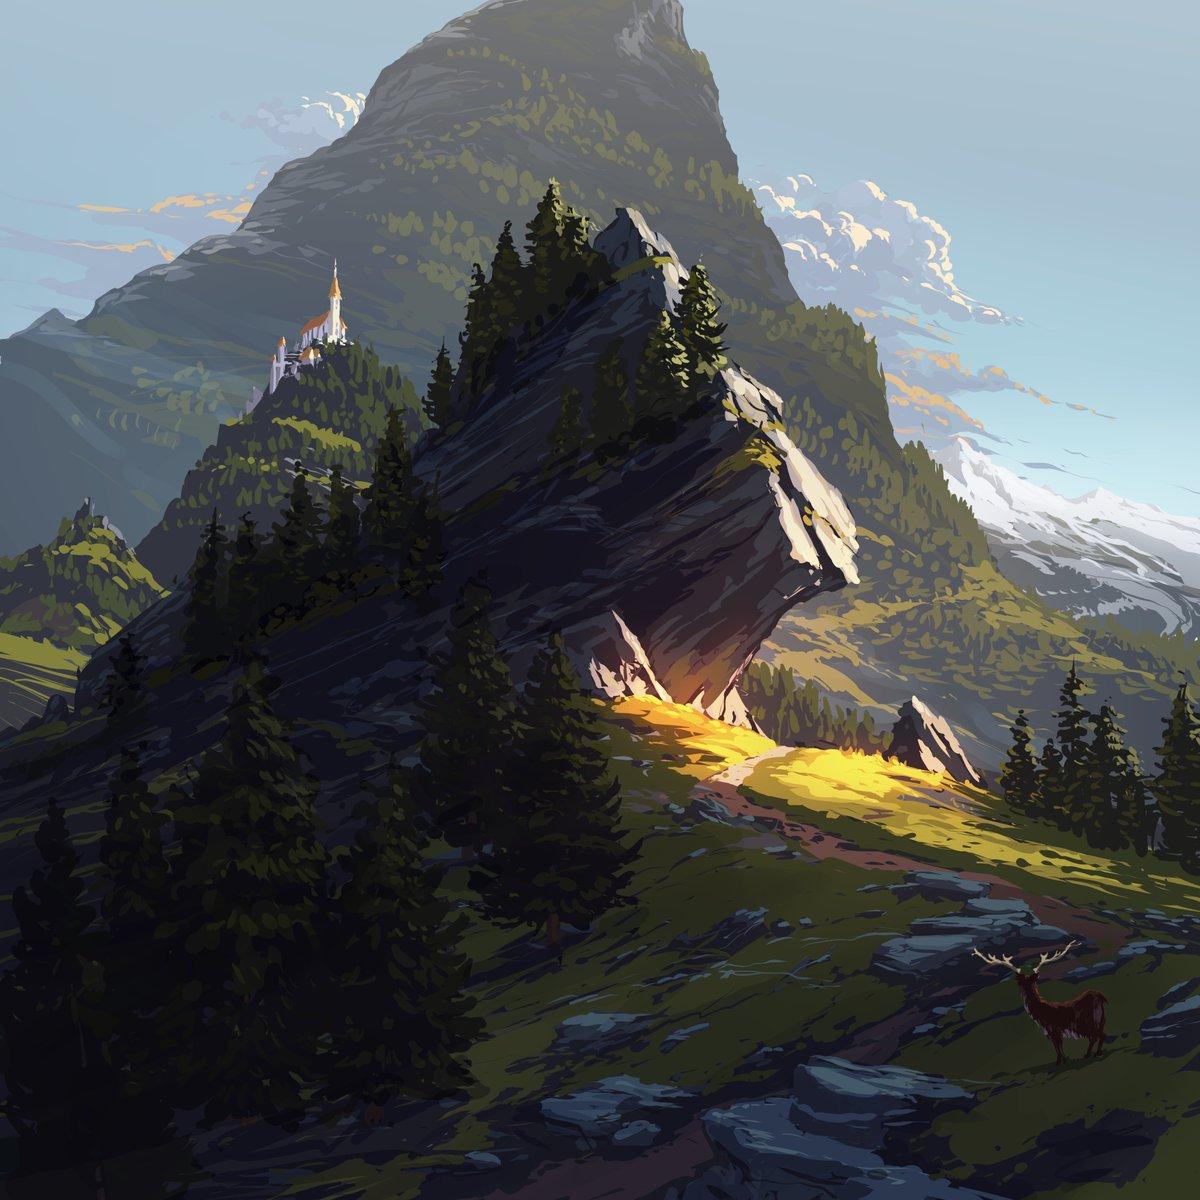 Some painting I did. #digitalart #digitalpainting #fantasy #environment #mountains #nature #rocks #sunsetpic.twitter.com/gmhSVwZnQN